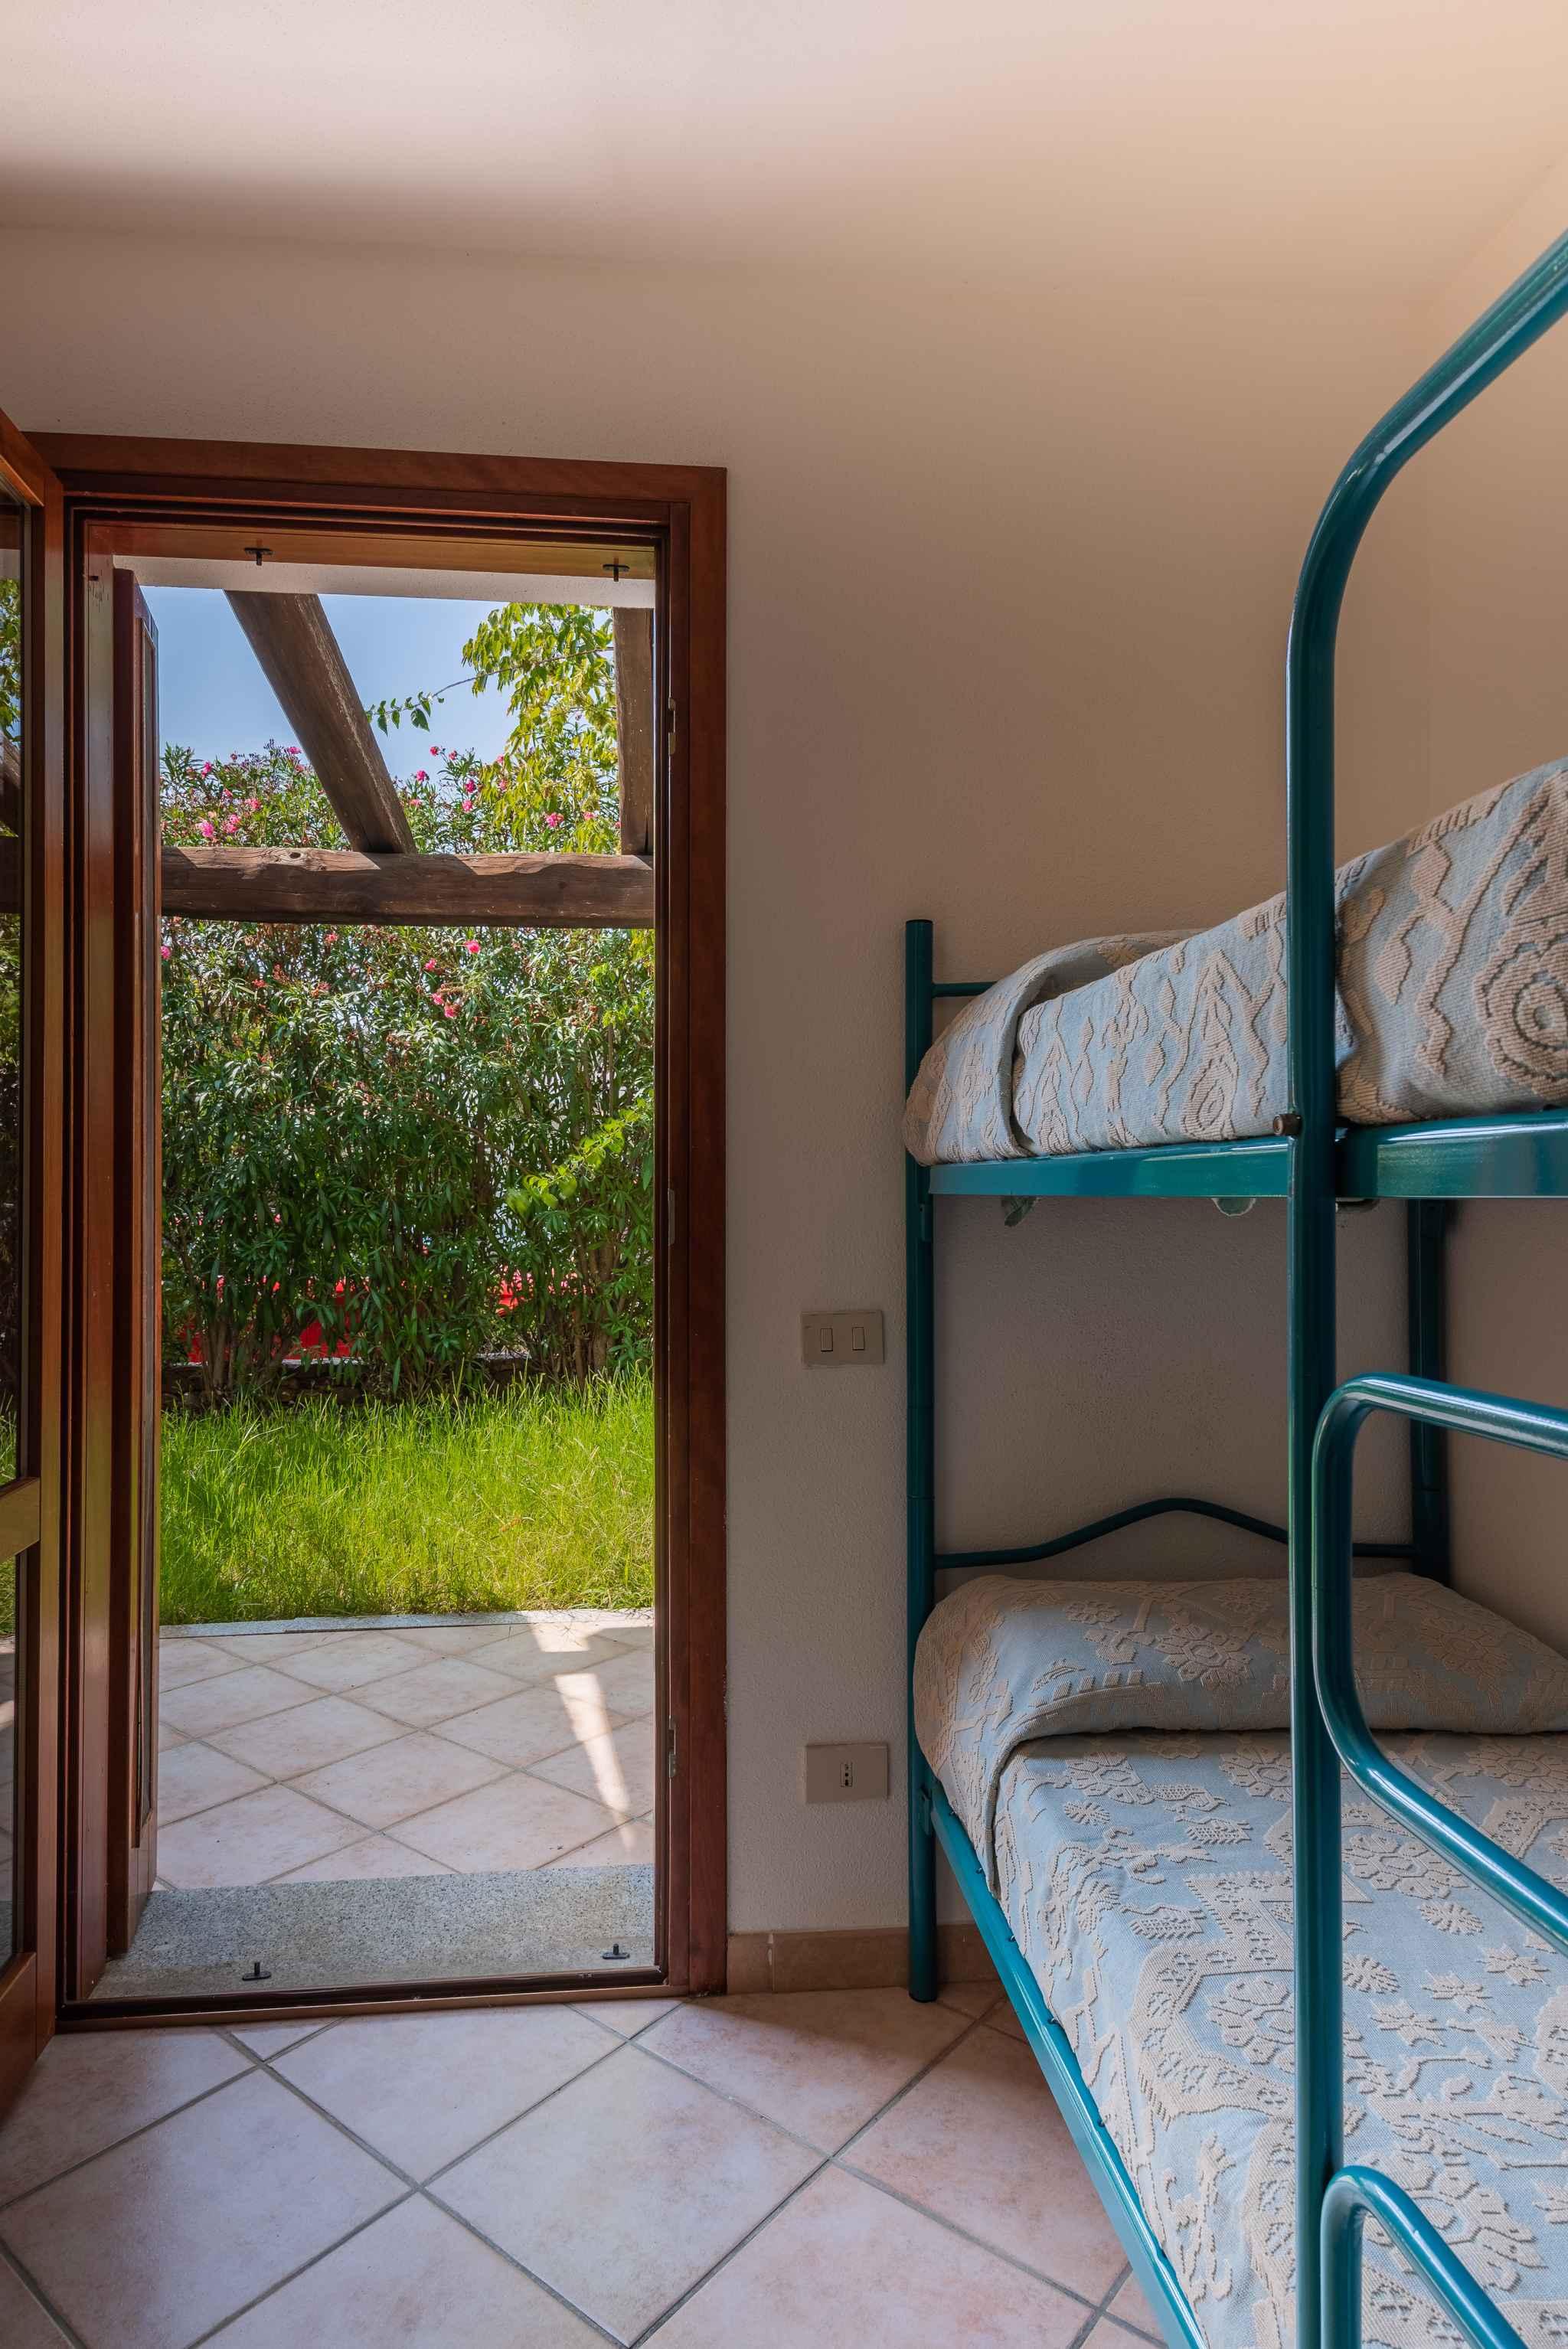 Ferienwohnung Appartamento 6 persone (2853261), Budoni, Olbia-Tempio, Sardinien, Italien, Bild 5